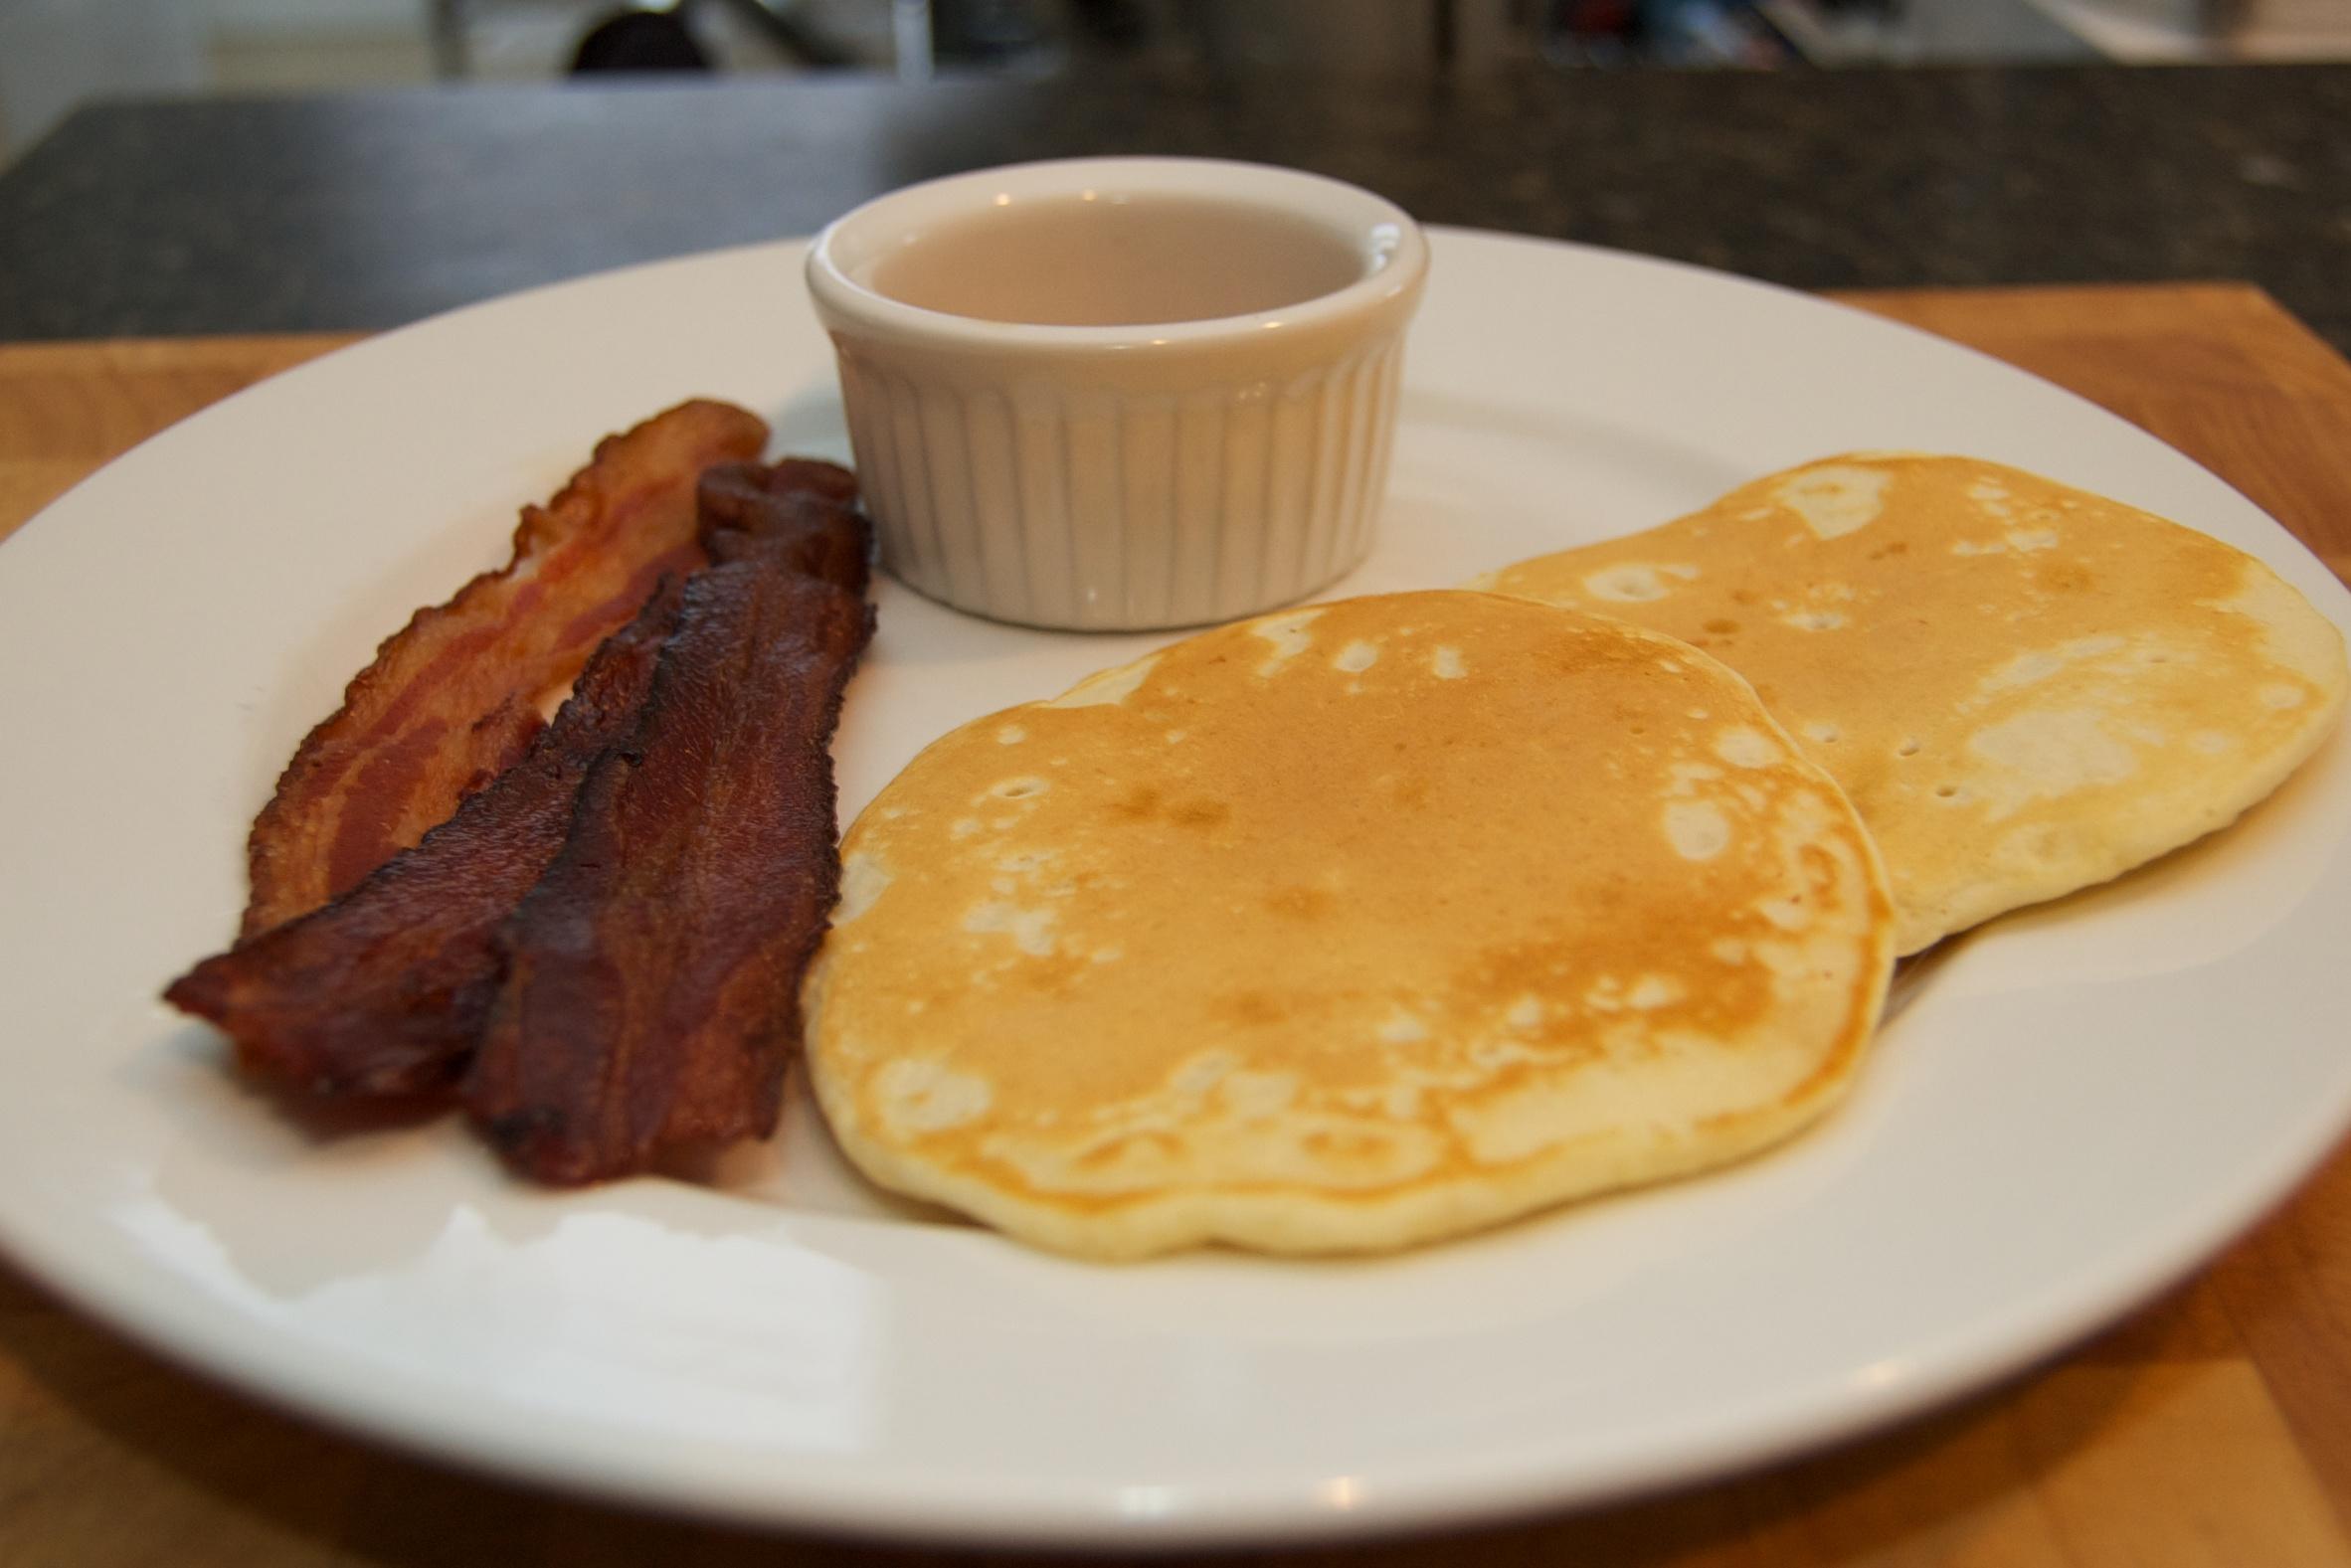 http://blog.rickk.com/food/2011/03/31/ate.2011.03.31.b.jpg